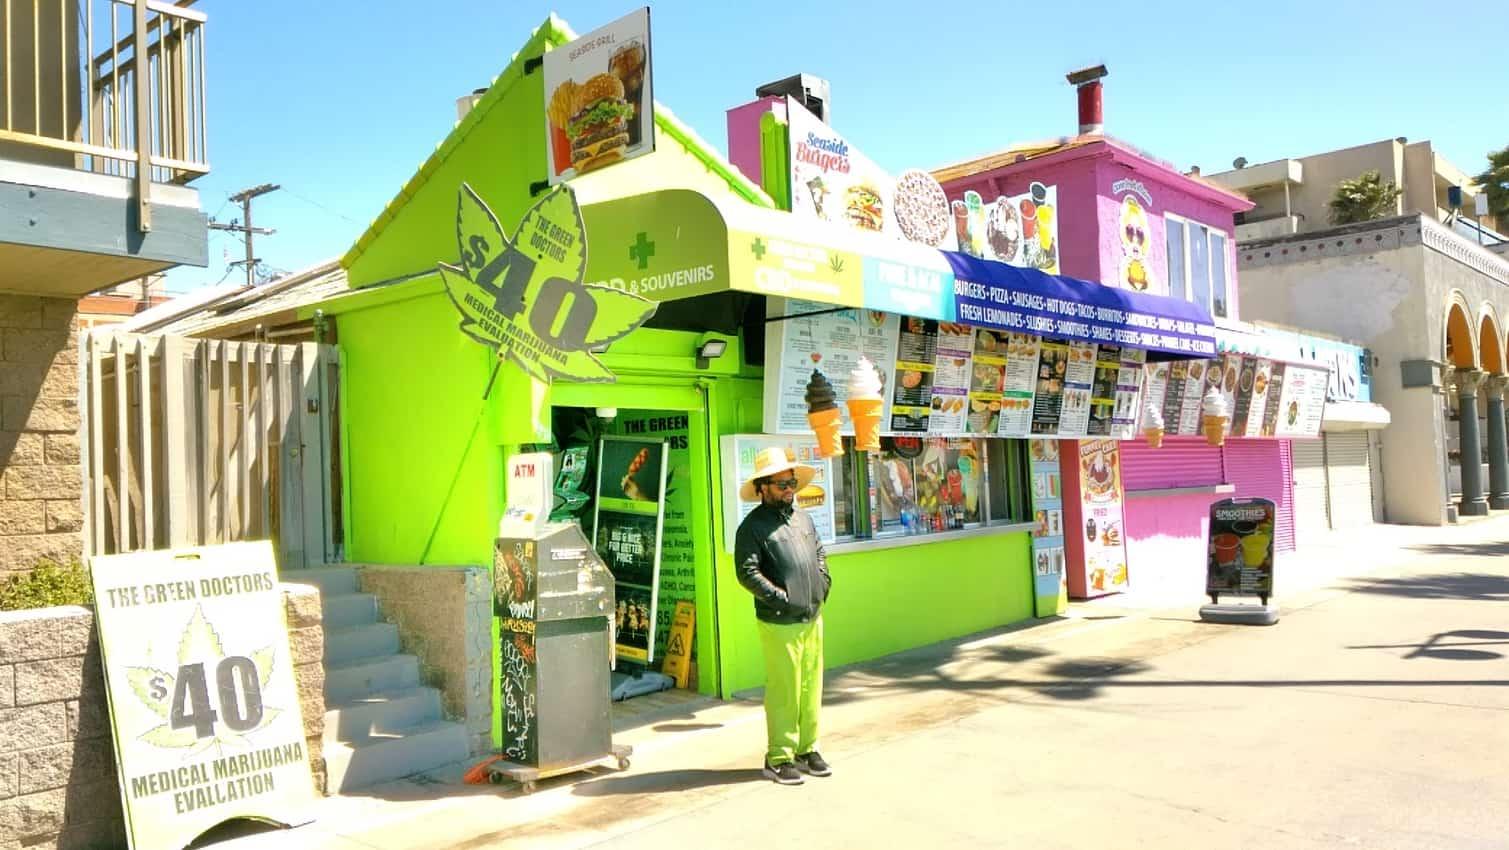 Open marijuana dispensary on the Venice Beach boardwalk; other shops are closed